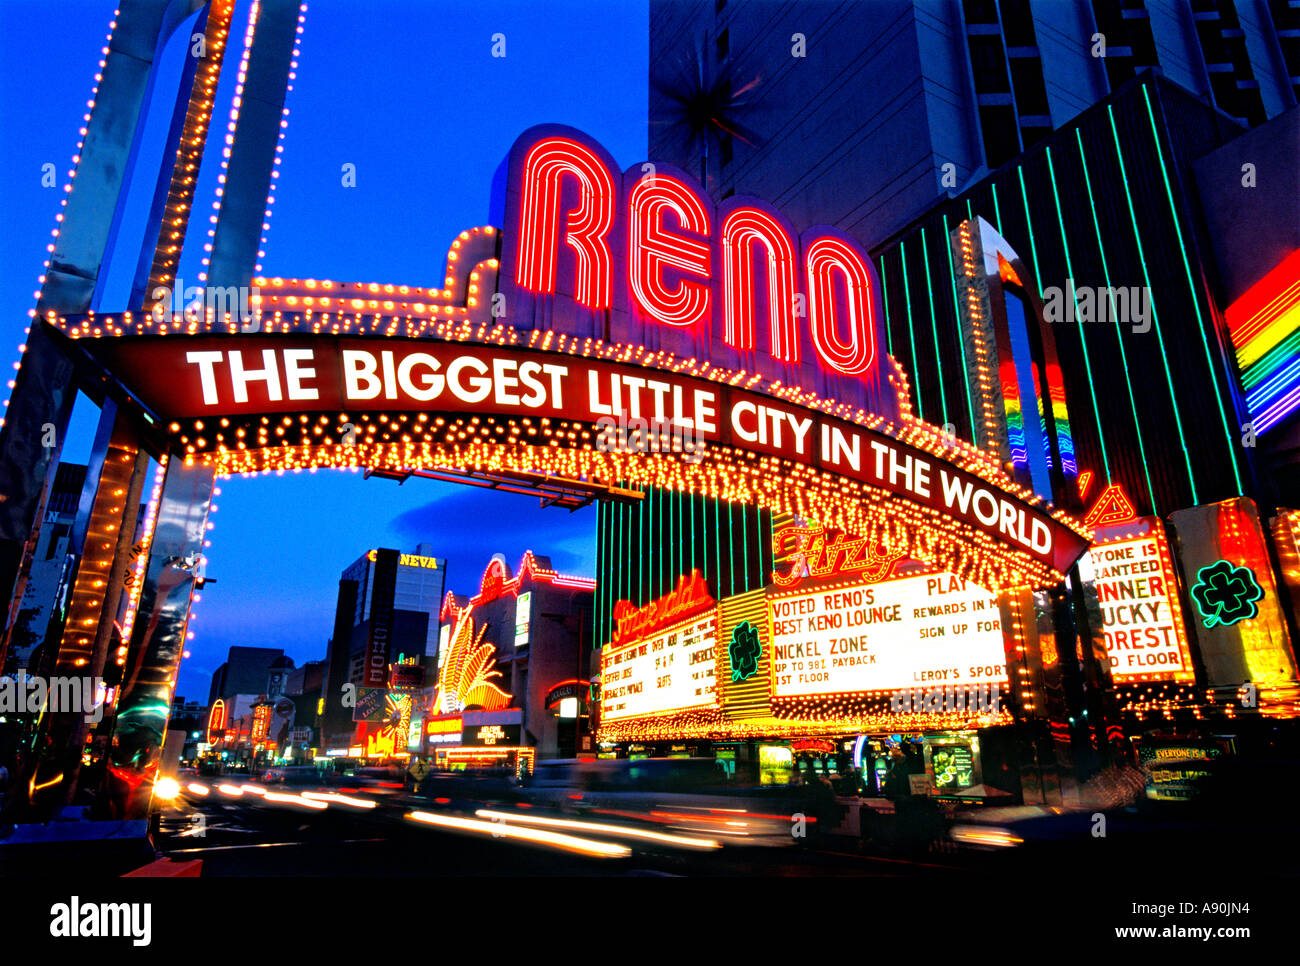 Image result for reno biggest little city